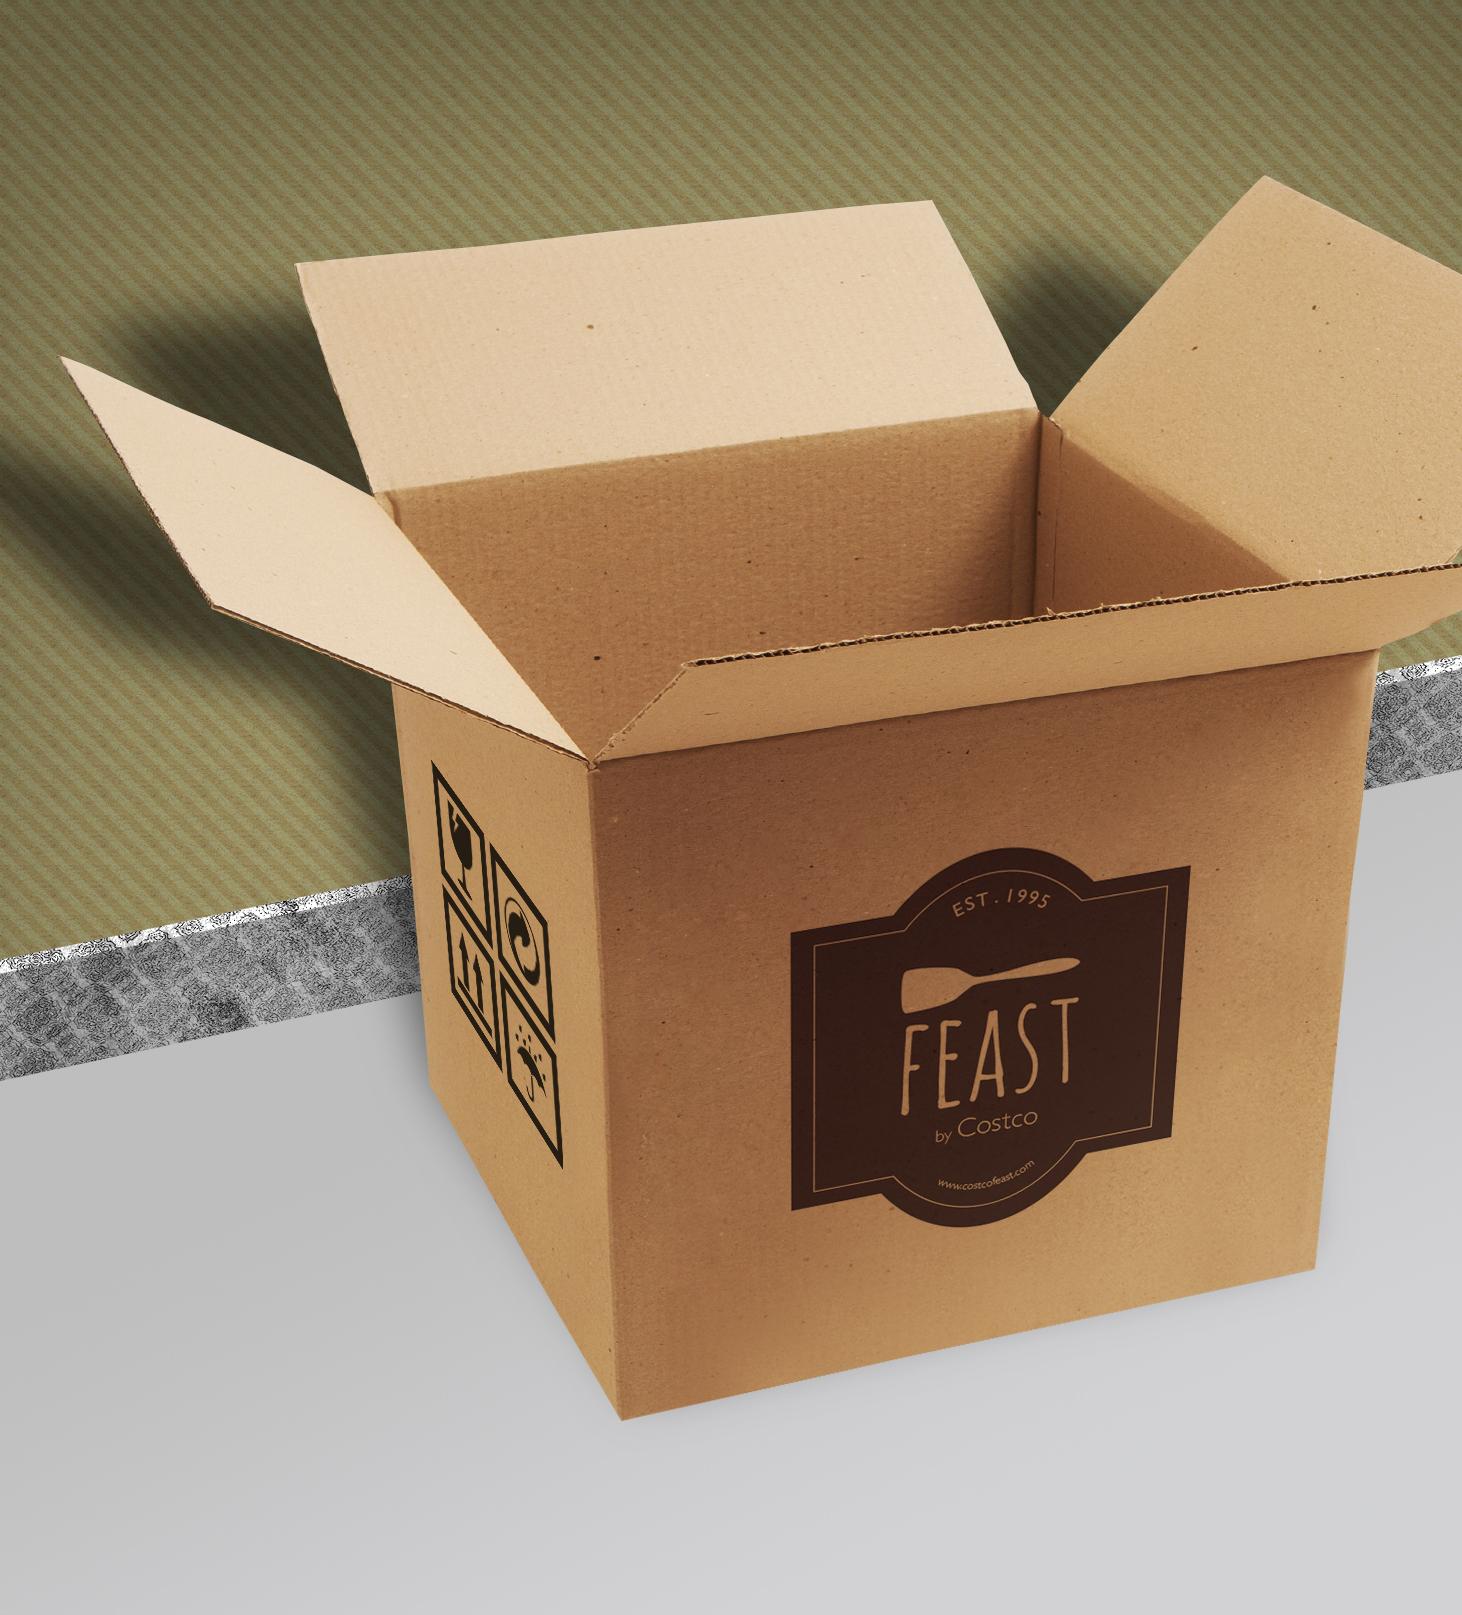 Free-Corrugated-Carton-Packaging-Mockup-PSD-File.jpg